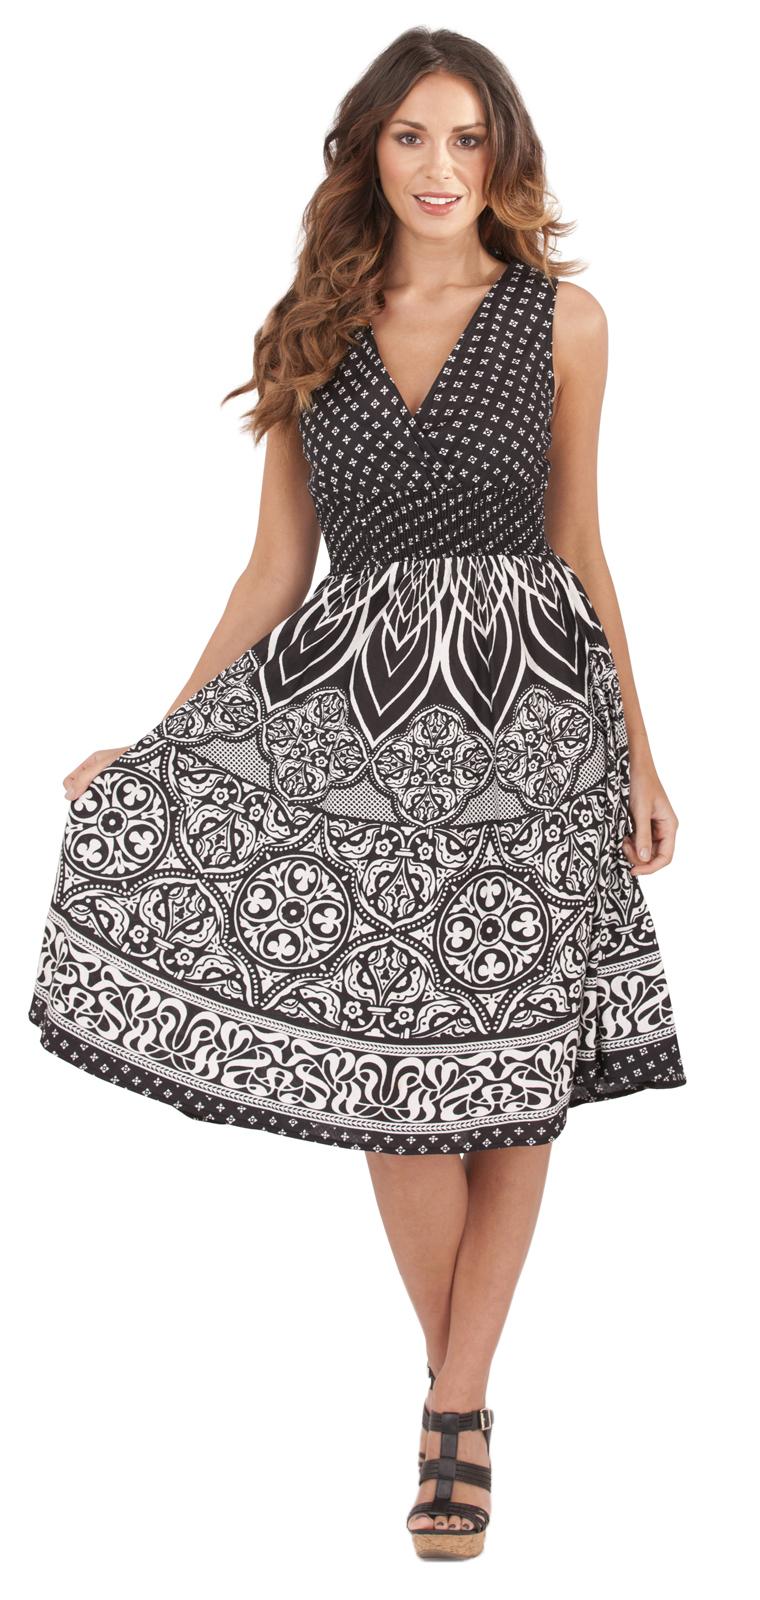 a88a4b4a364 Black Plus Size Dresses 18 16 14 Women Trendy Sleeveless